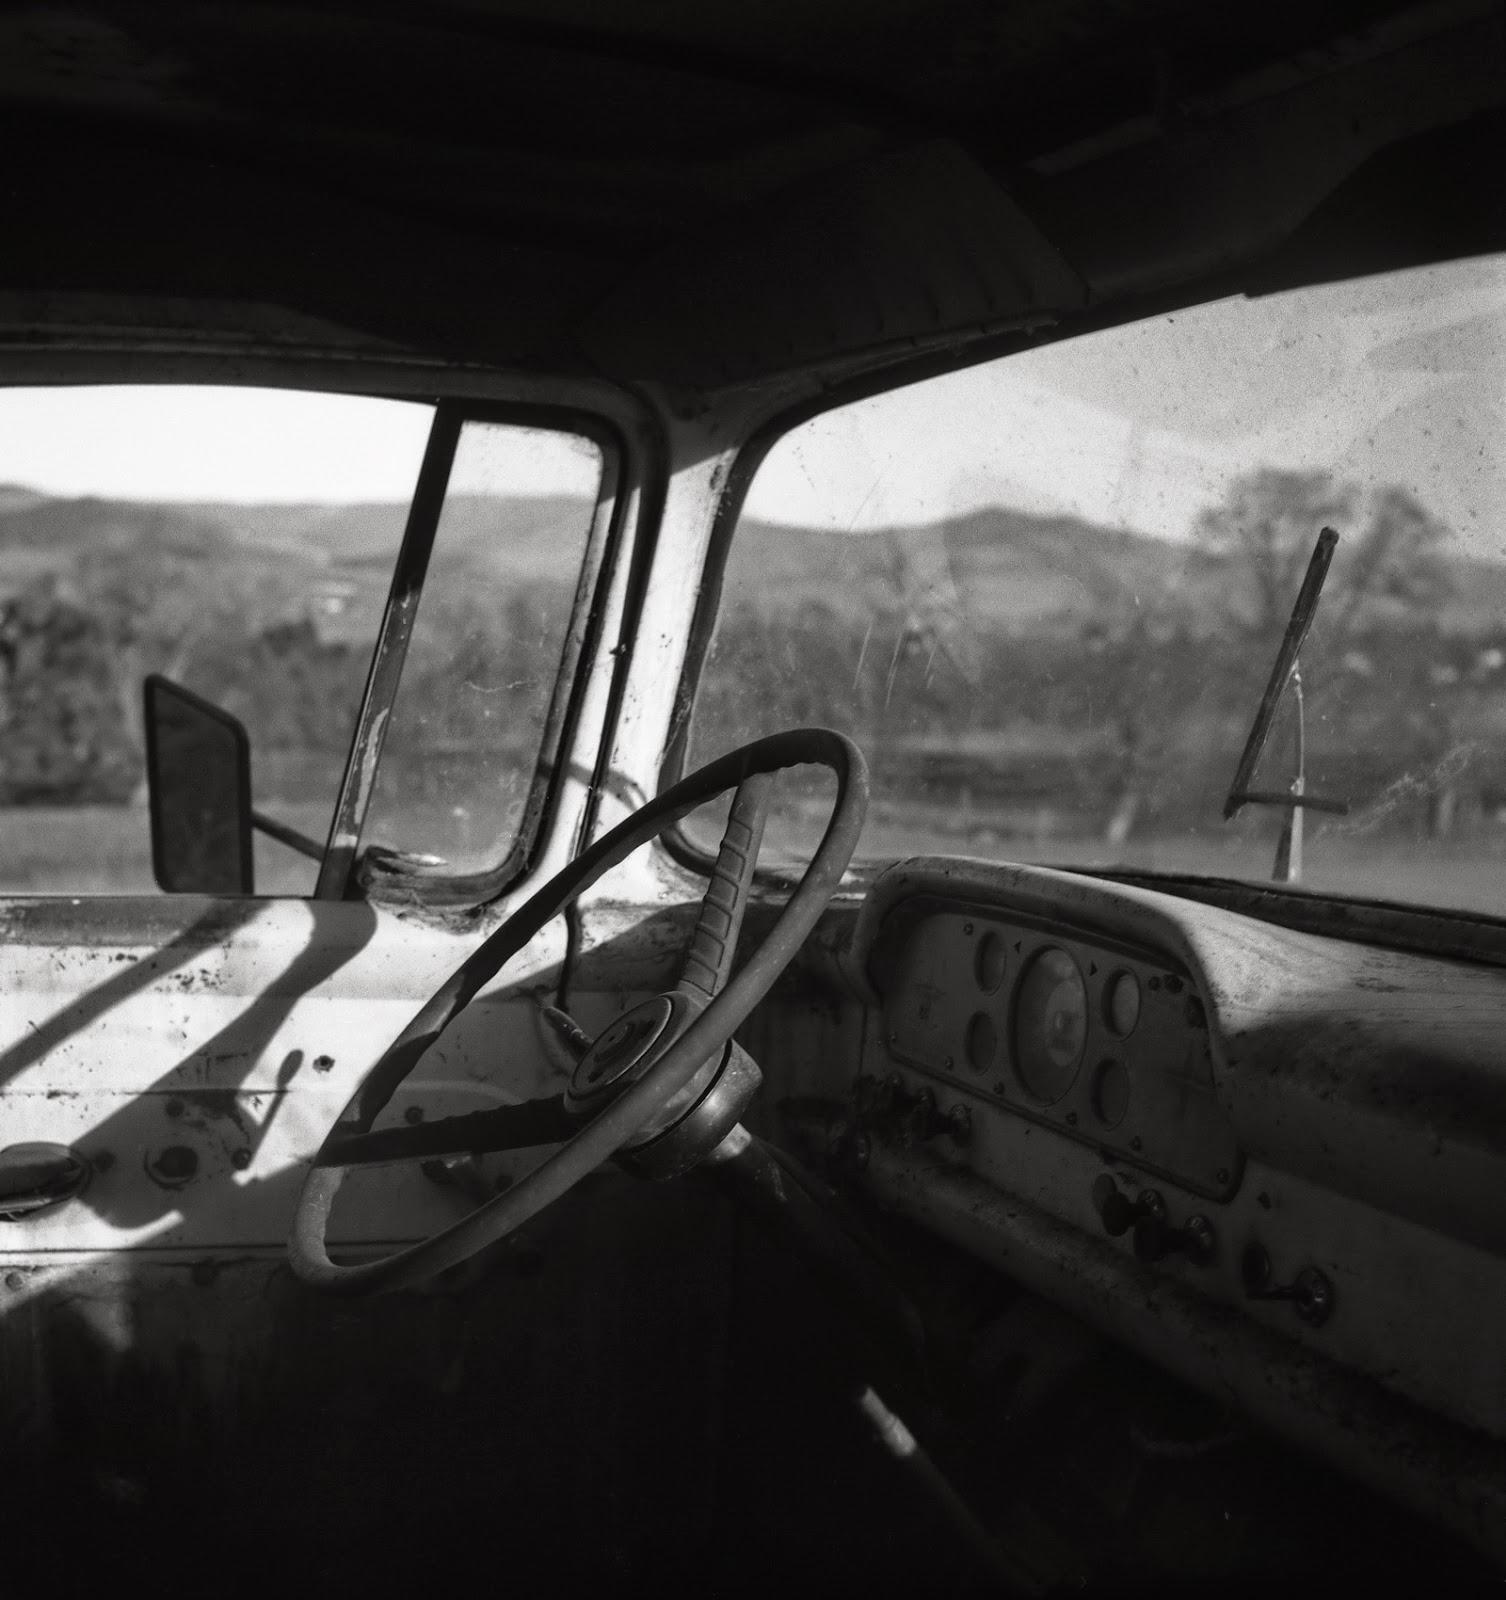 Dinosaur Speak Rp Thomas 1941 Ford Farm Truck To Rolleiflex Tlr Camera Same That Vivian Maier Shot With Uses Medium Format Film Taken At Billings Farmashland 1958